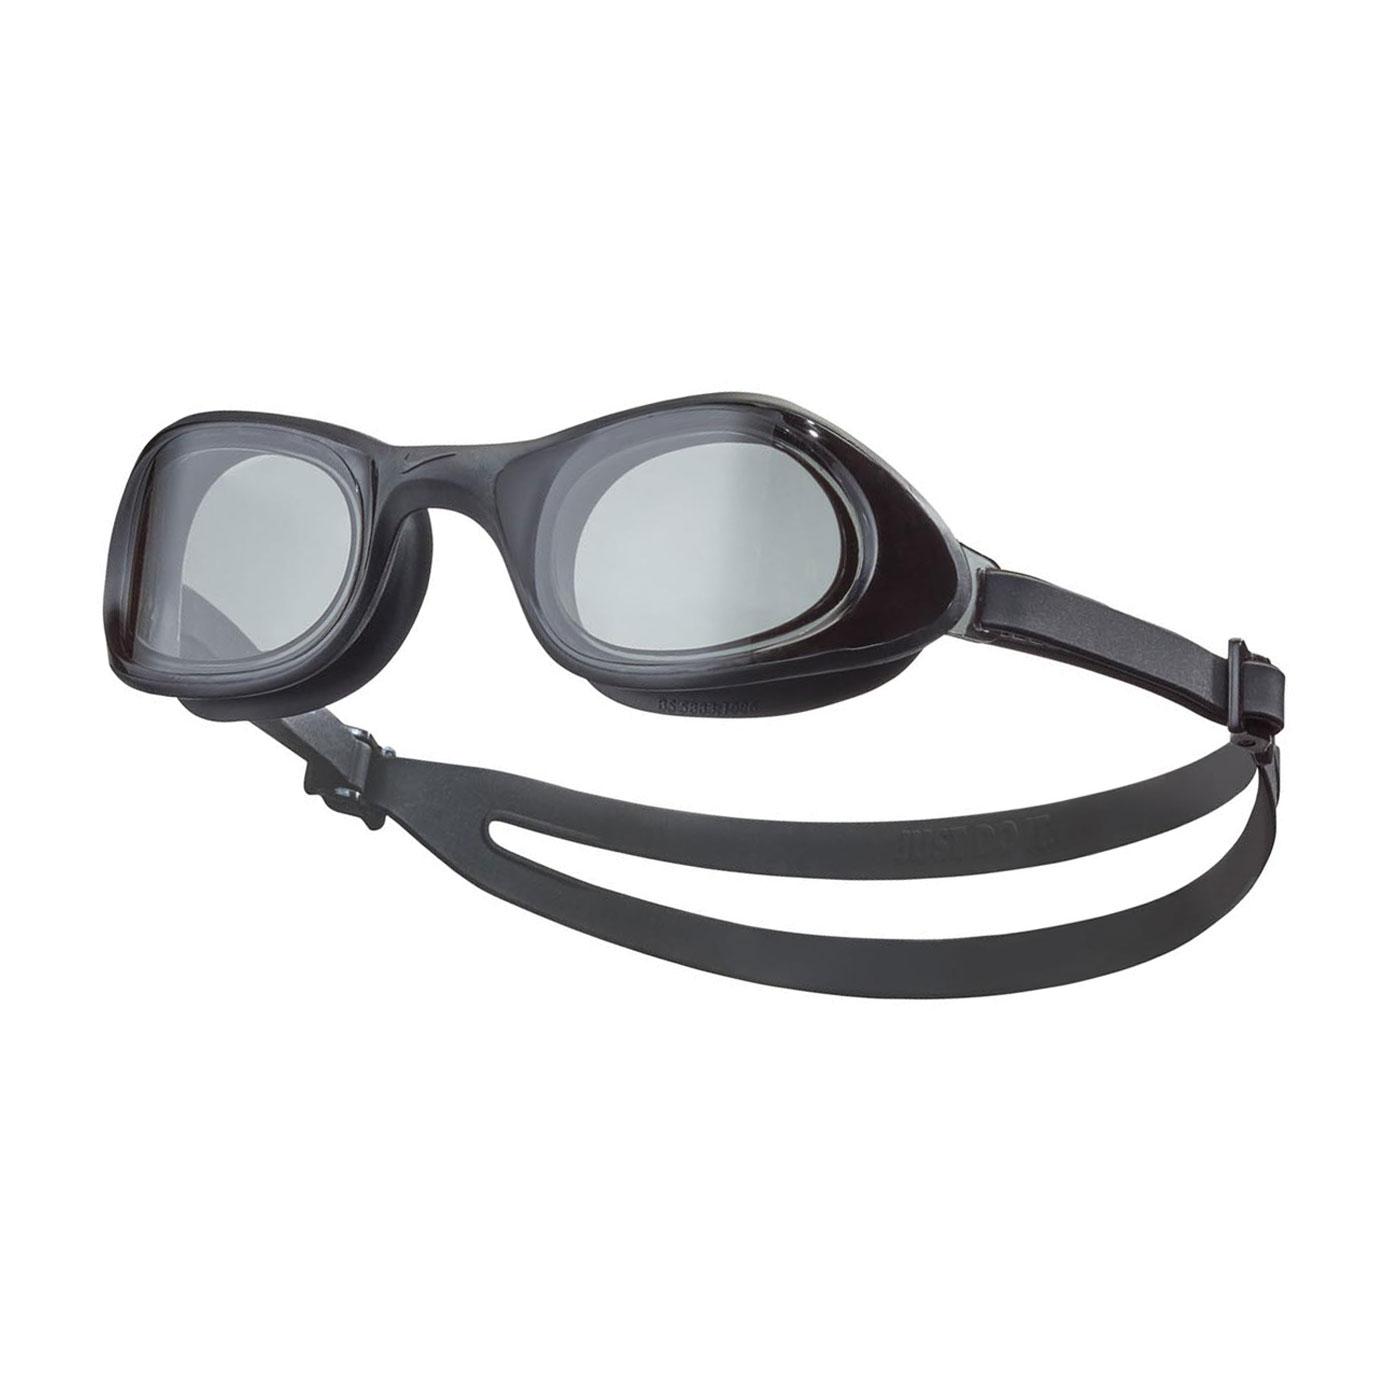 NIKE SWIM 成人超廣角泳鏡 NESSB161-014 - 黑